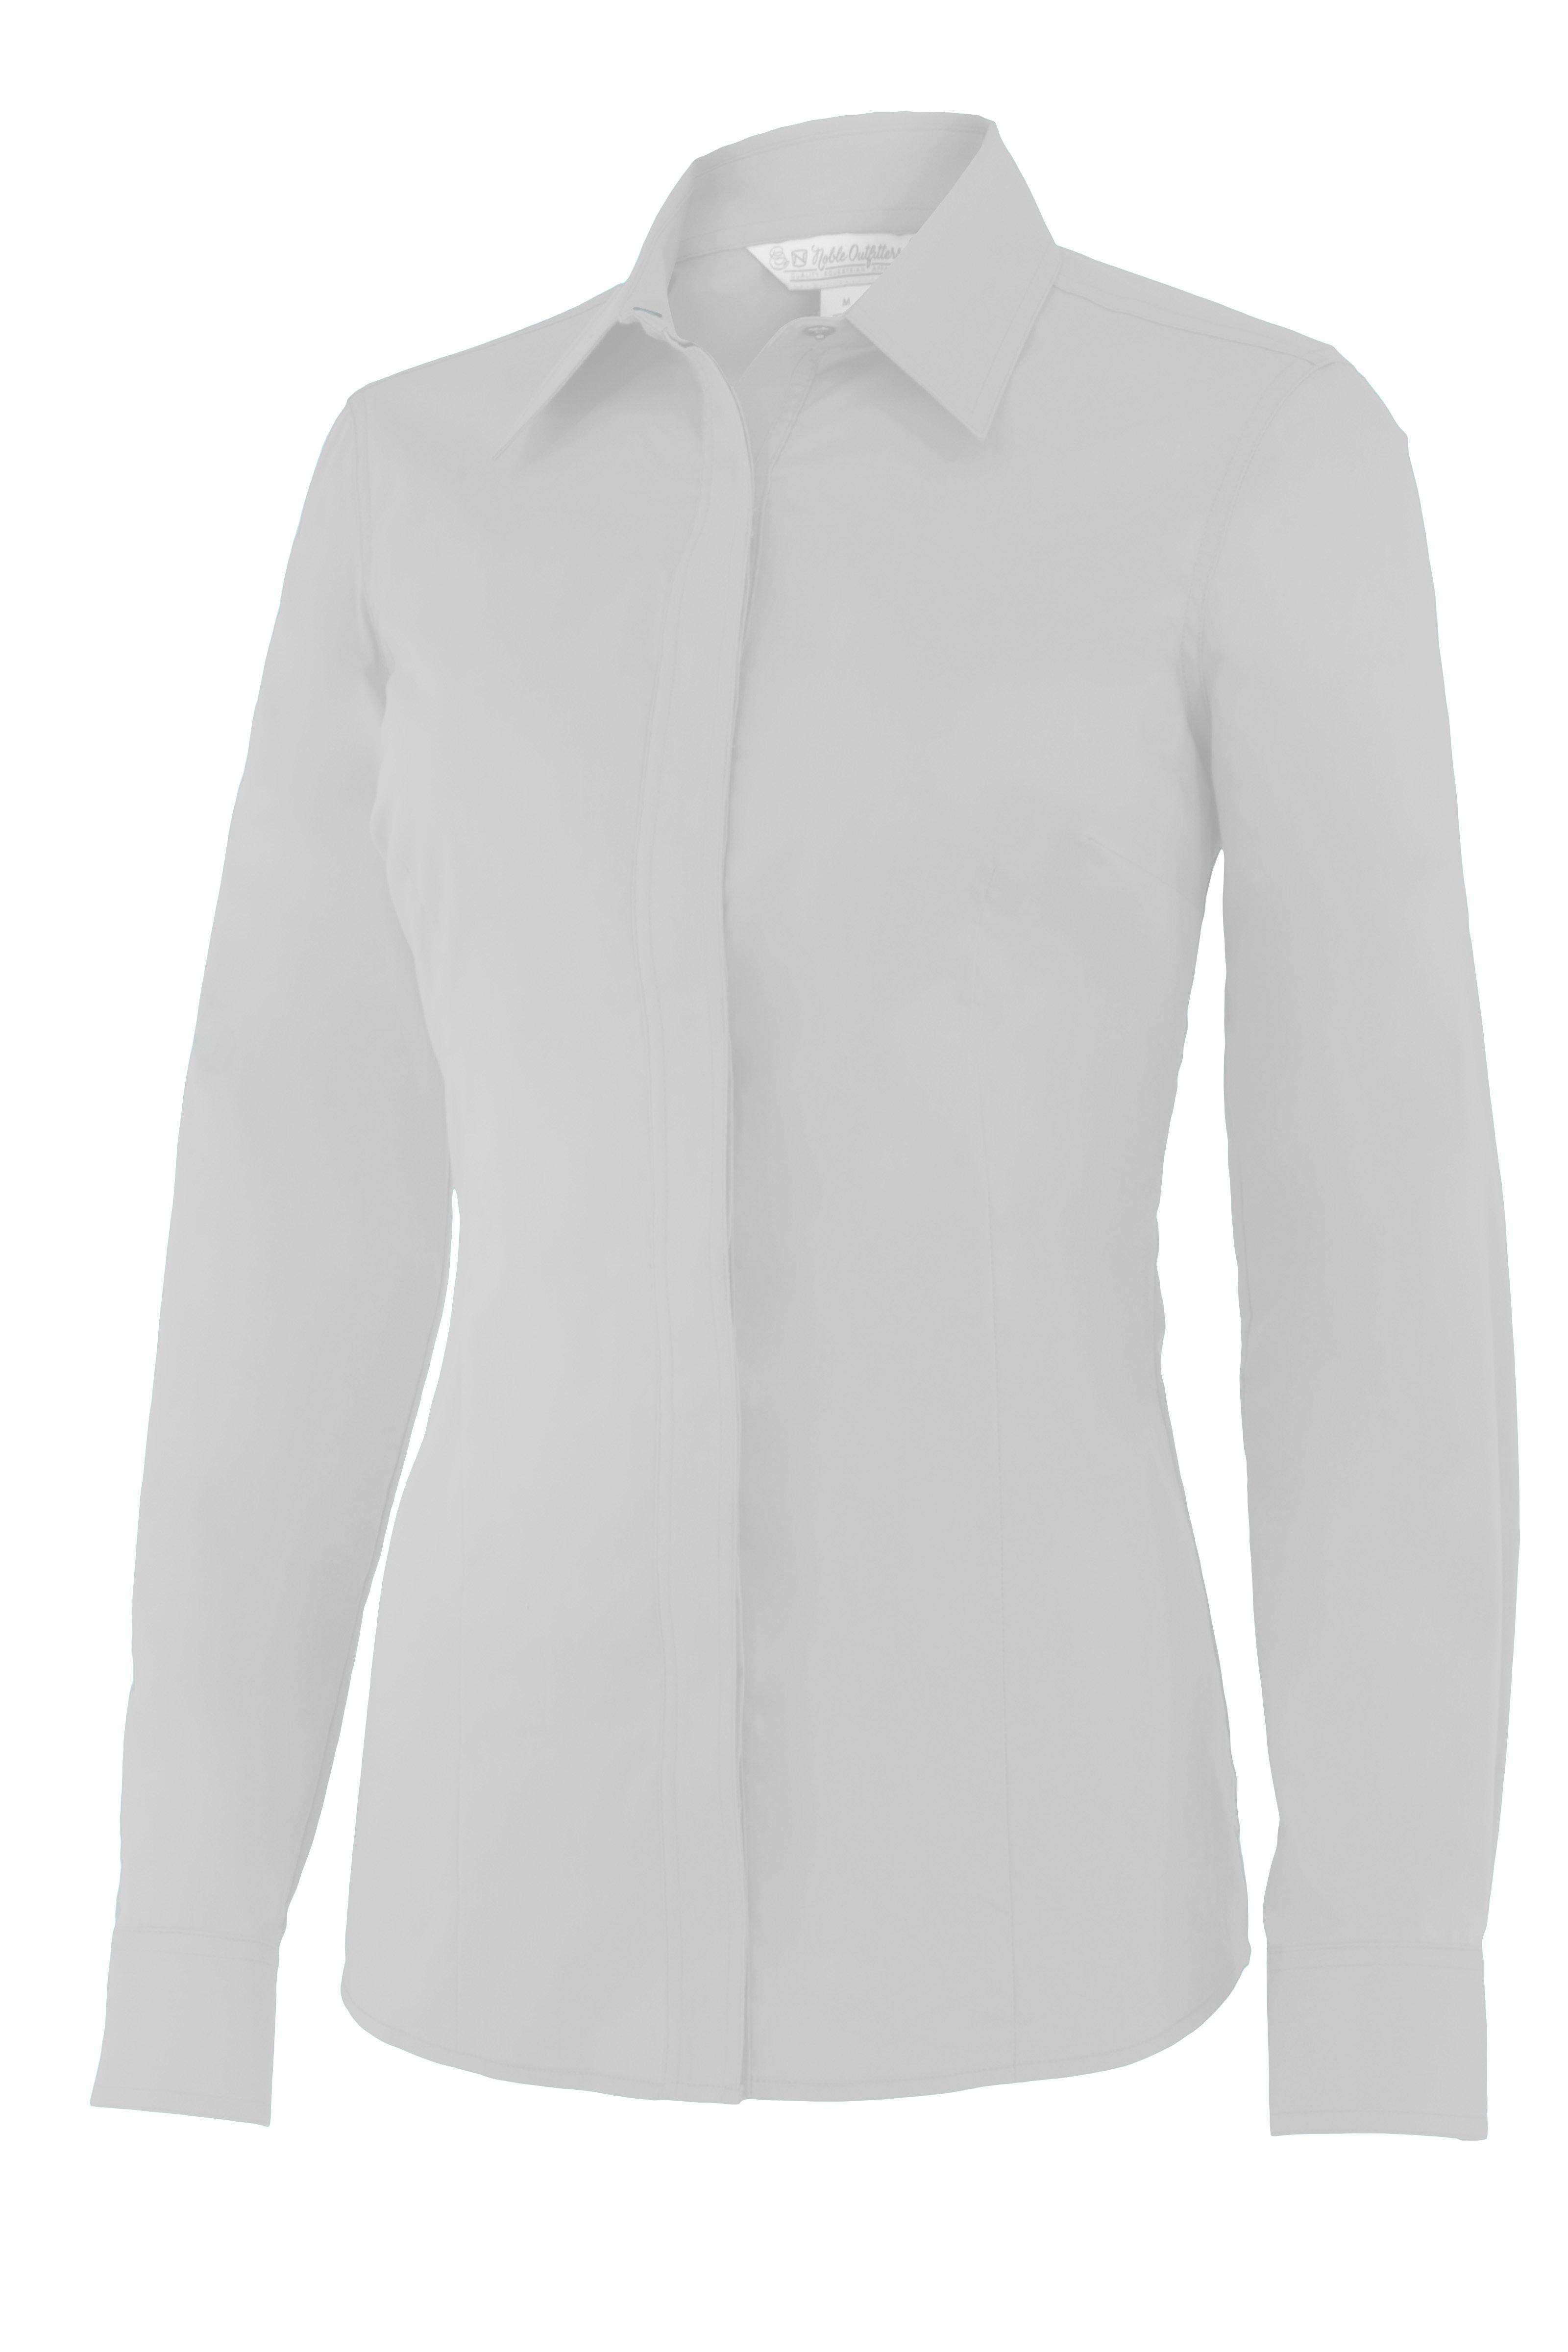 Noble Perfect Fit Show Shirt XLarge White YKQ8YQBY6KRF8